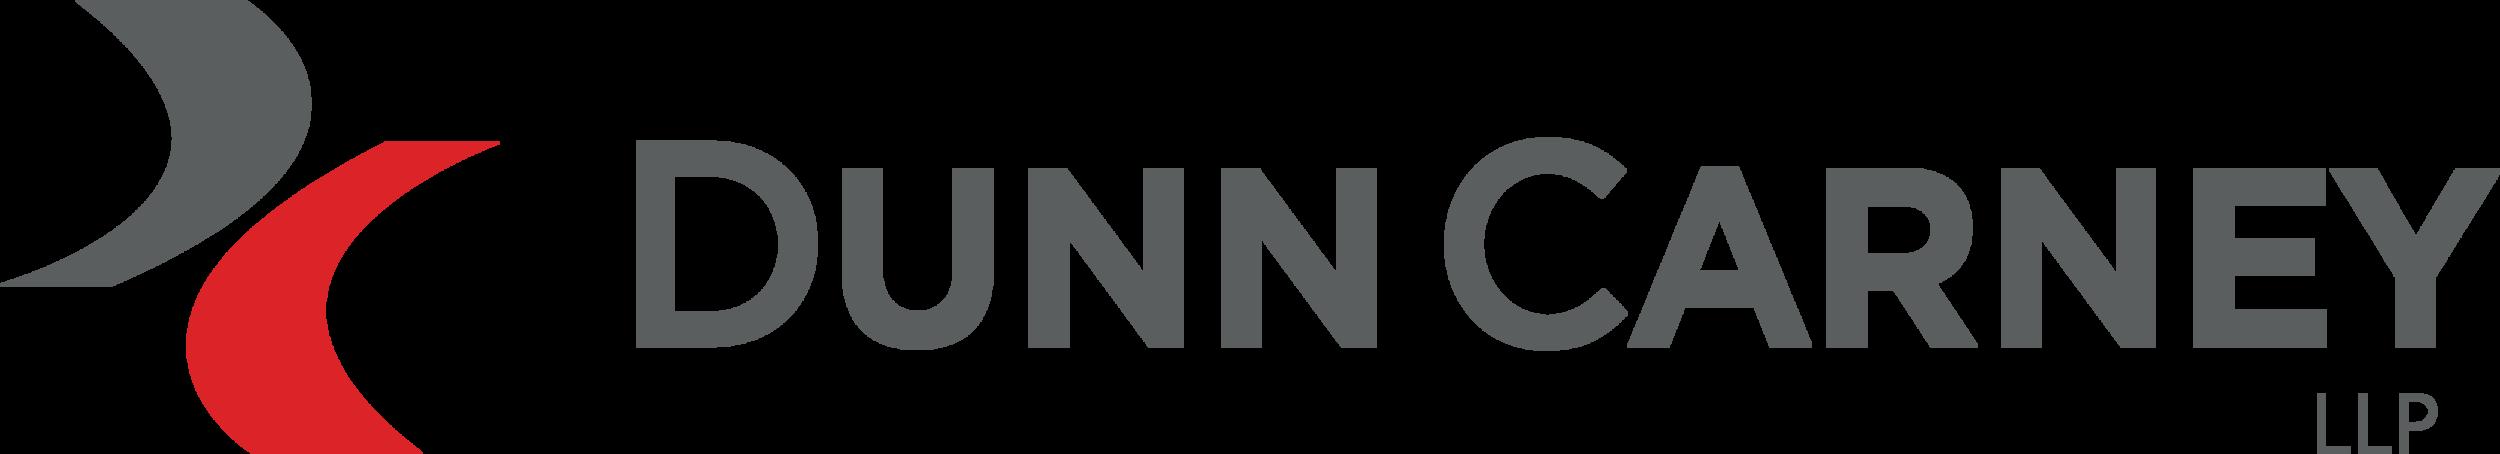 Dunn Carney logo.png